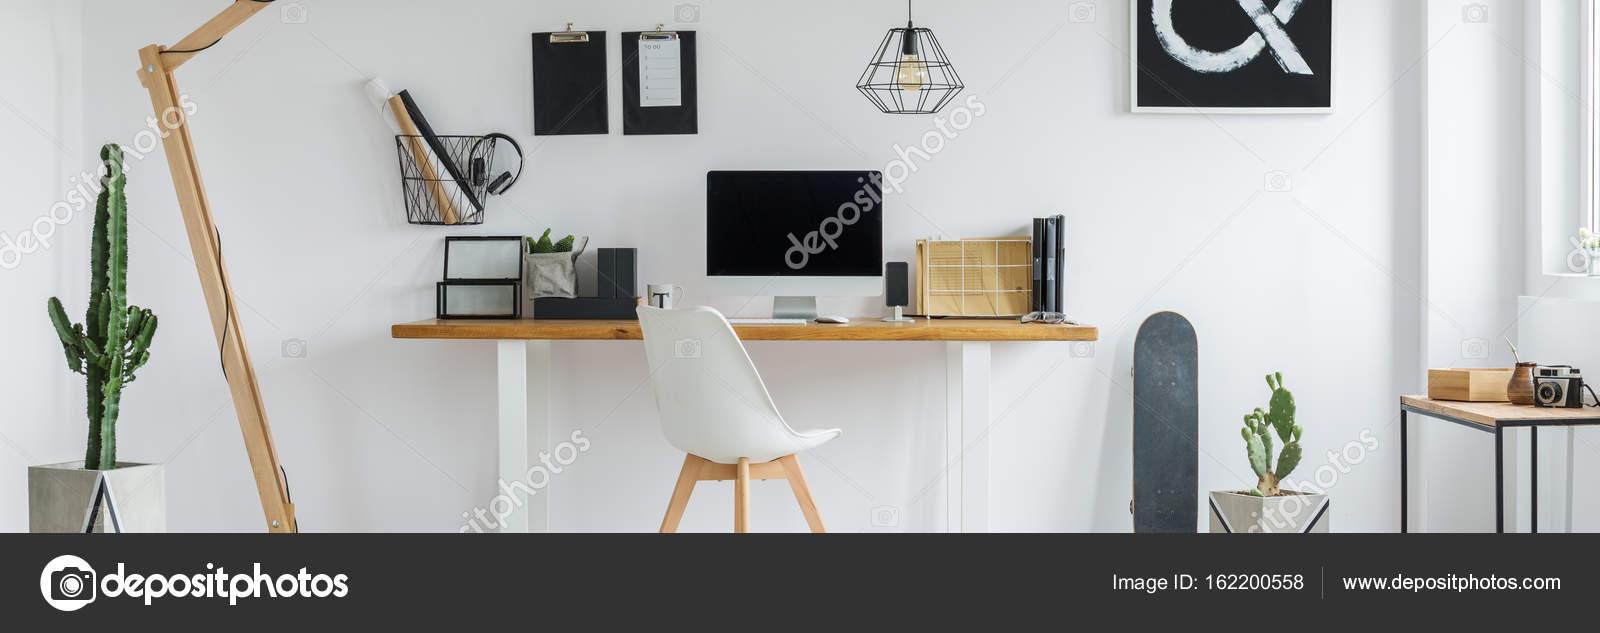 Depositphotos & Minimalist home office \u2014 Stock Photo © photographee.eu ...